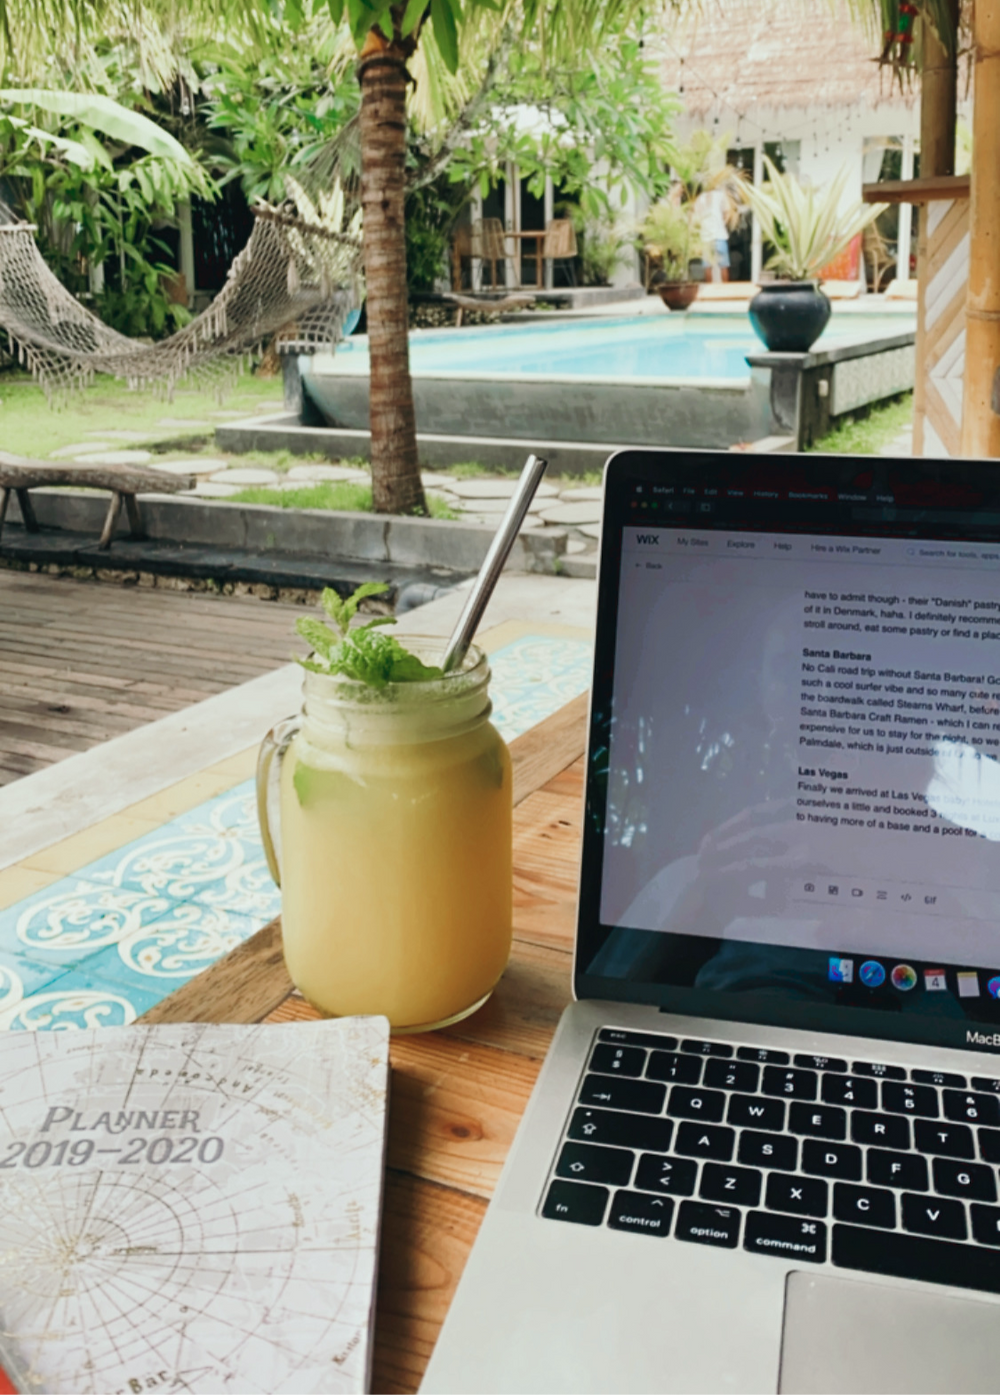 dreamsea Canggu cafe with pool digital nomad work